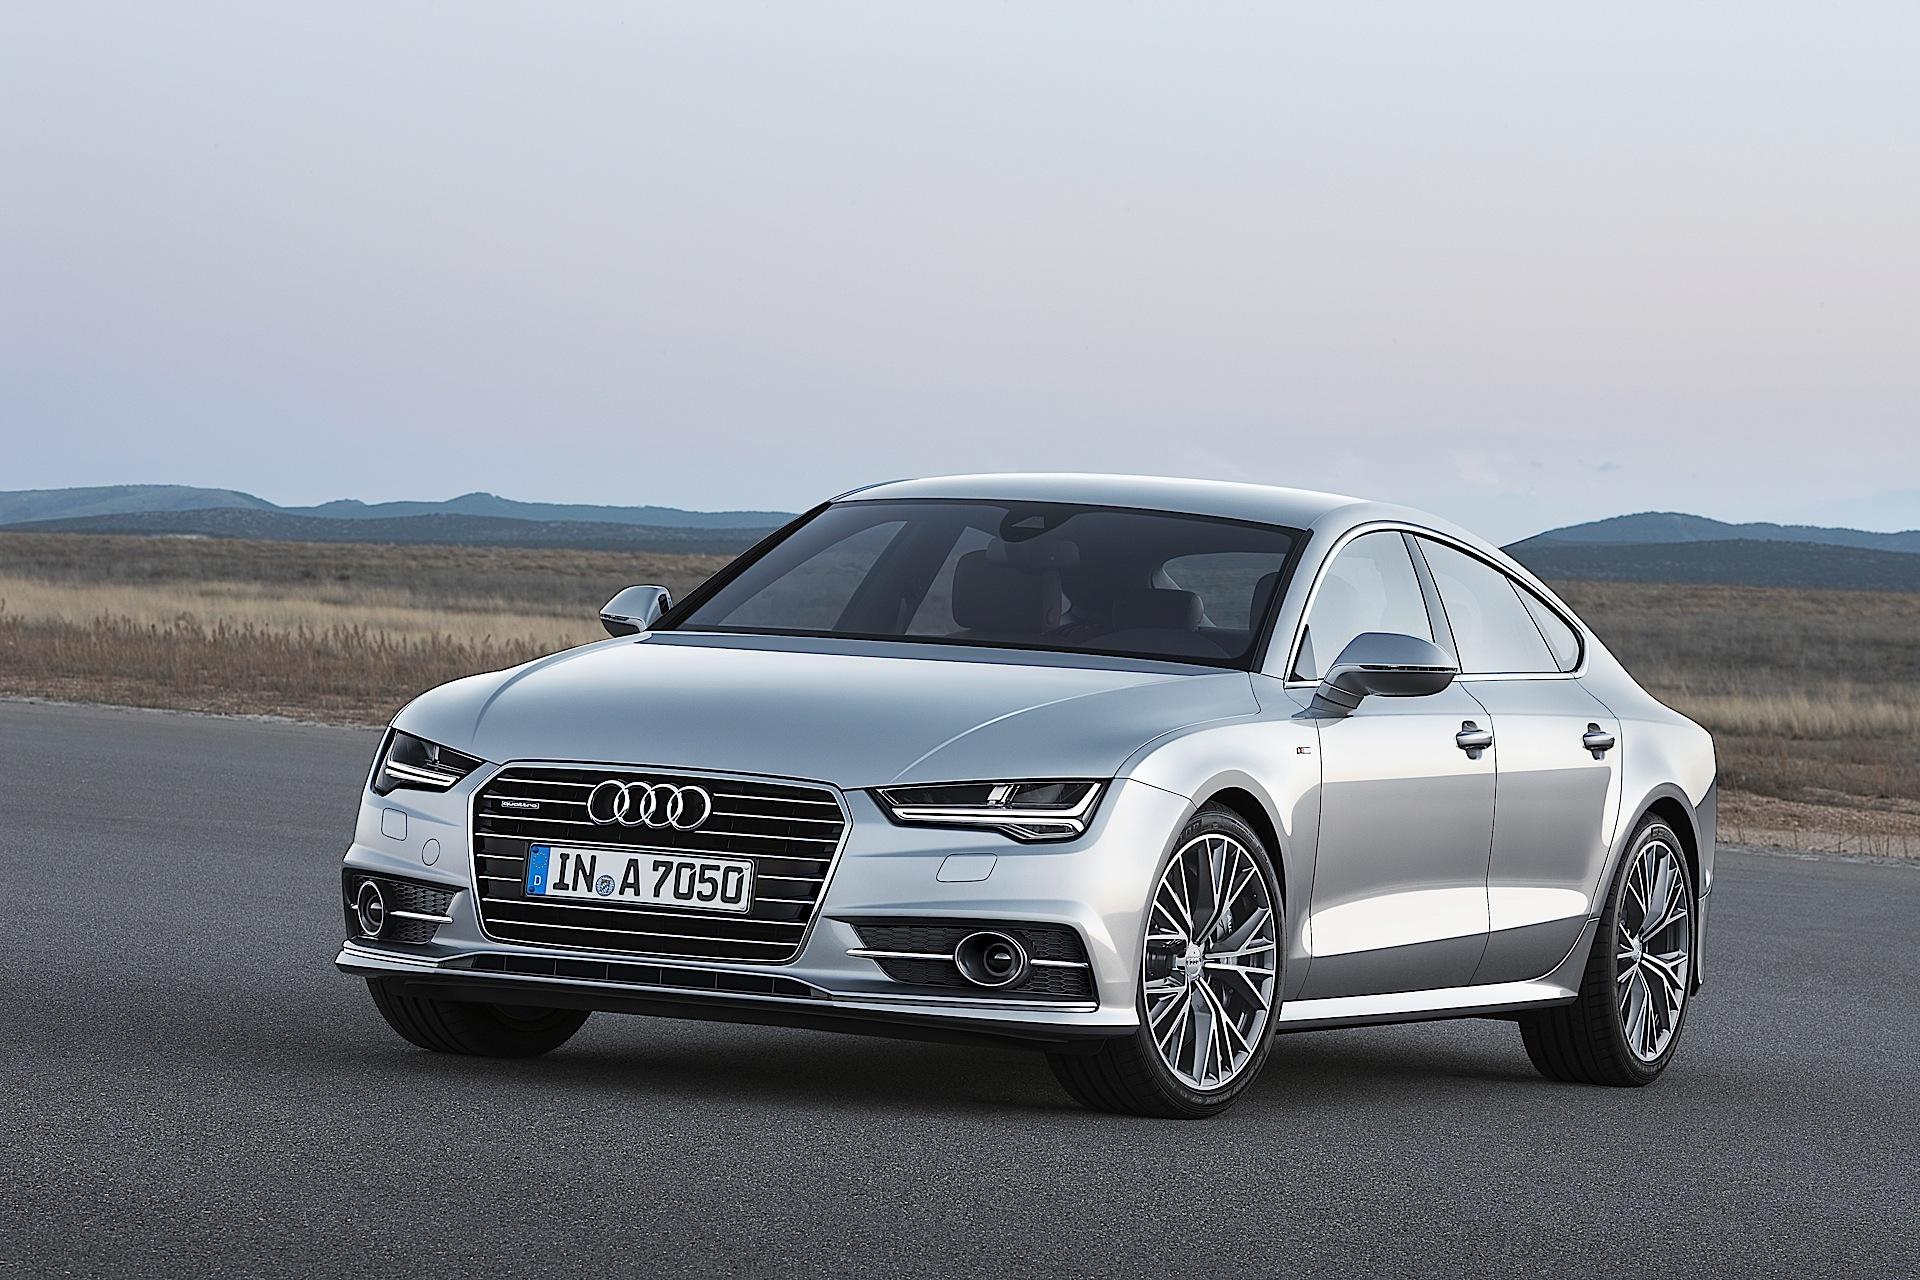 Kelebihan Audi A7 2014 Murah Berkualitas